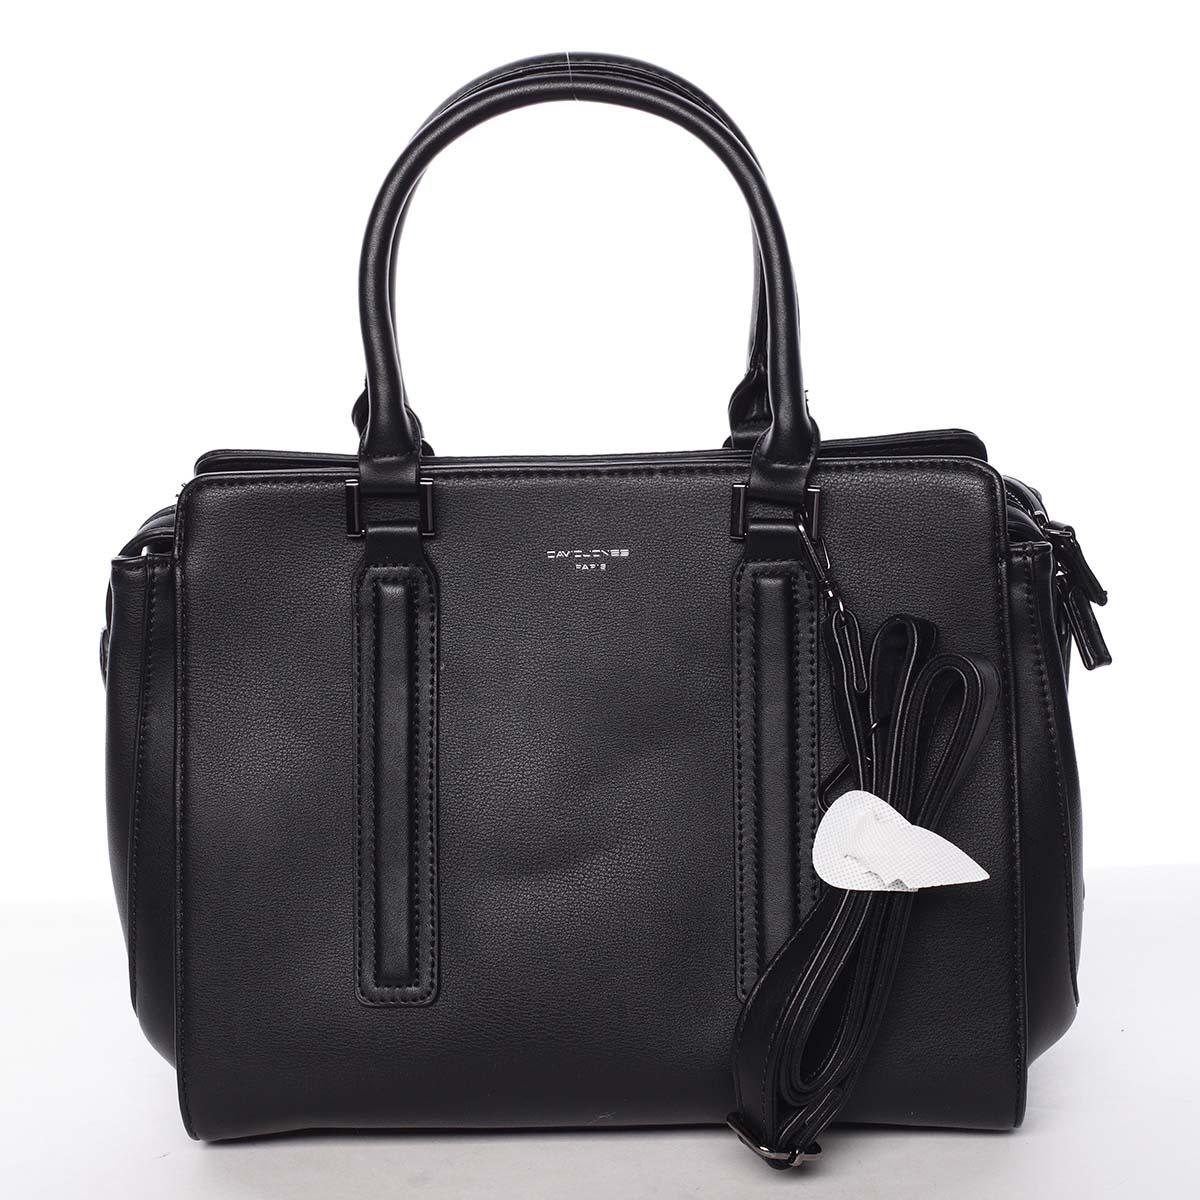 6c932ced5 Elegantná štýlová dámska čierna kabelka - David Jones Amedee - Kabea.cz